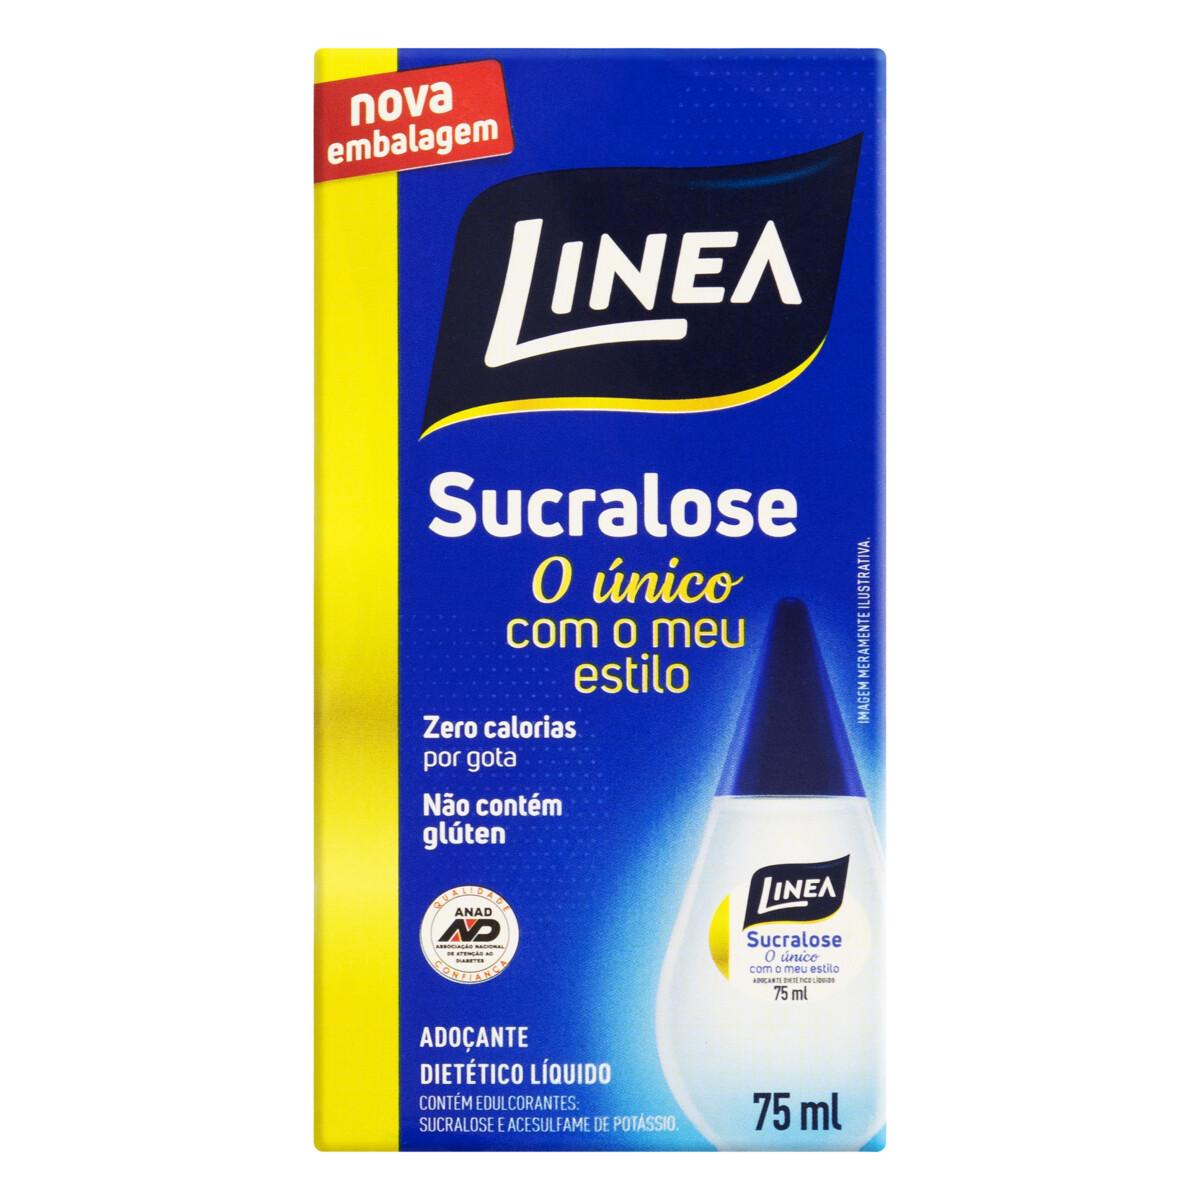 Adoçante Líquido Sucralose Linea Caixa 75ml